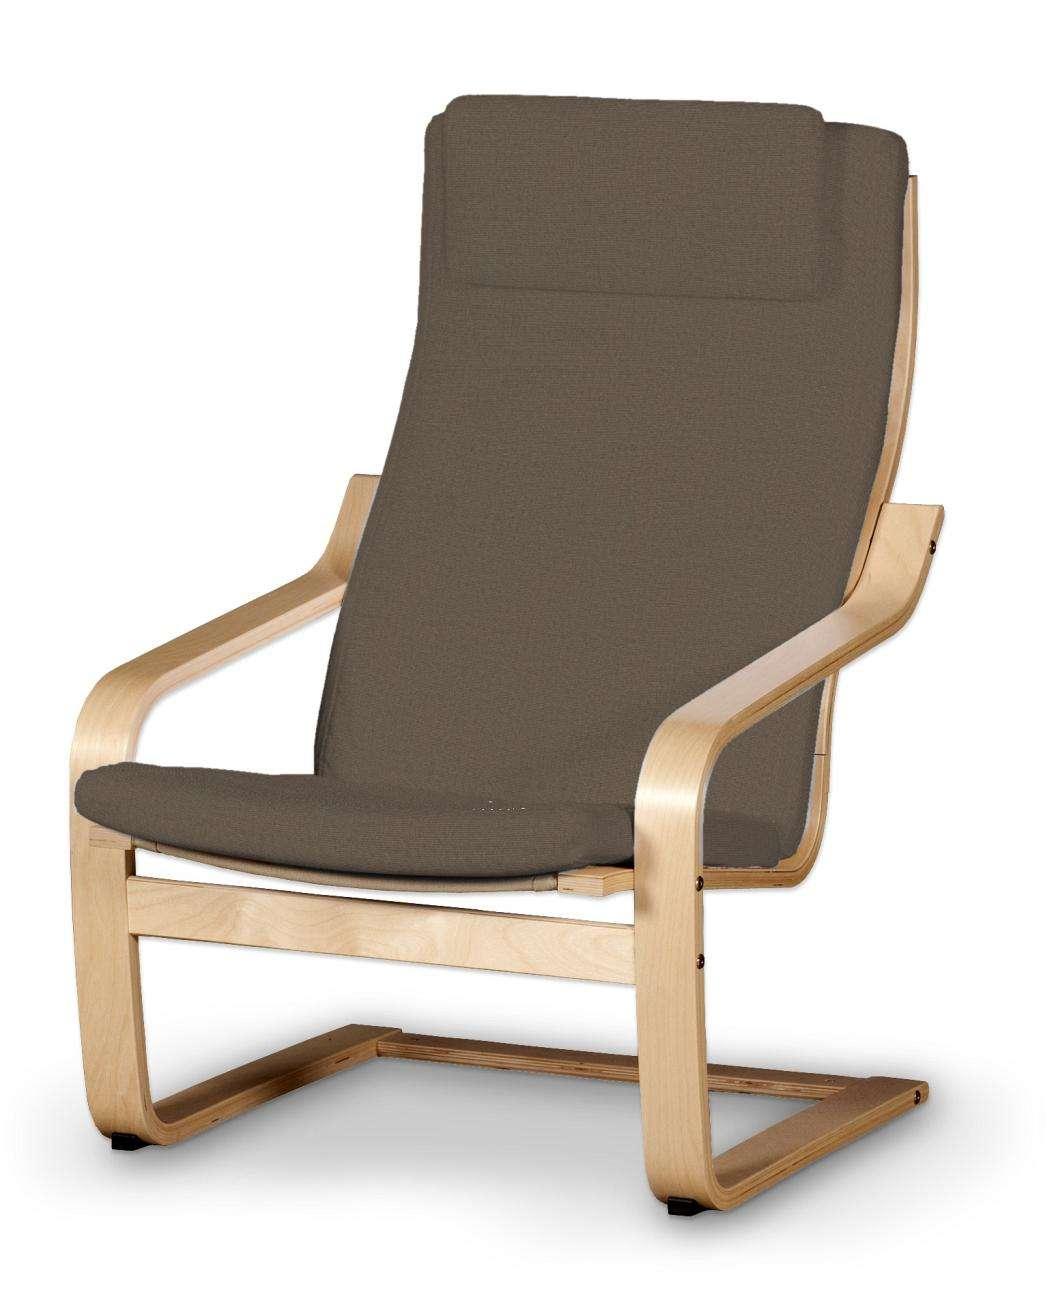 Poduszka na fotel Poäng II Fotel Poäng II w kolekcji Etna , tkanina: 705-08